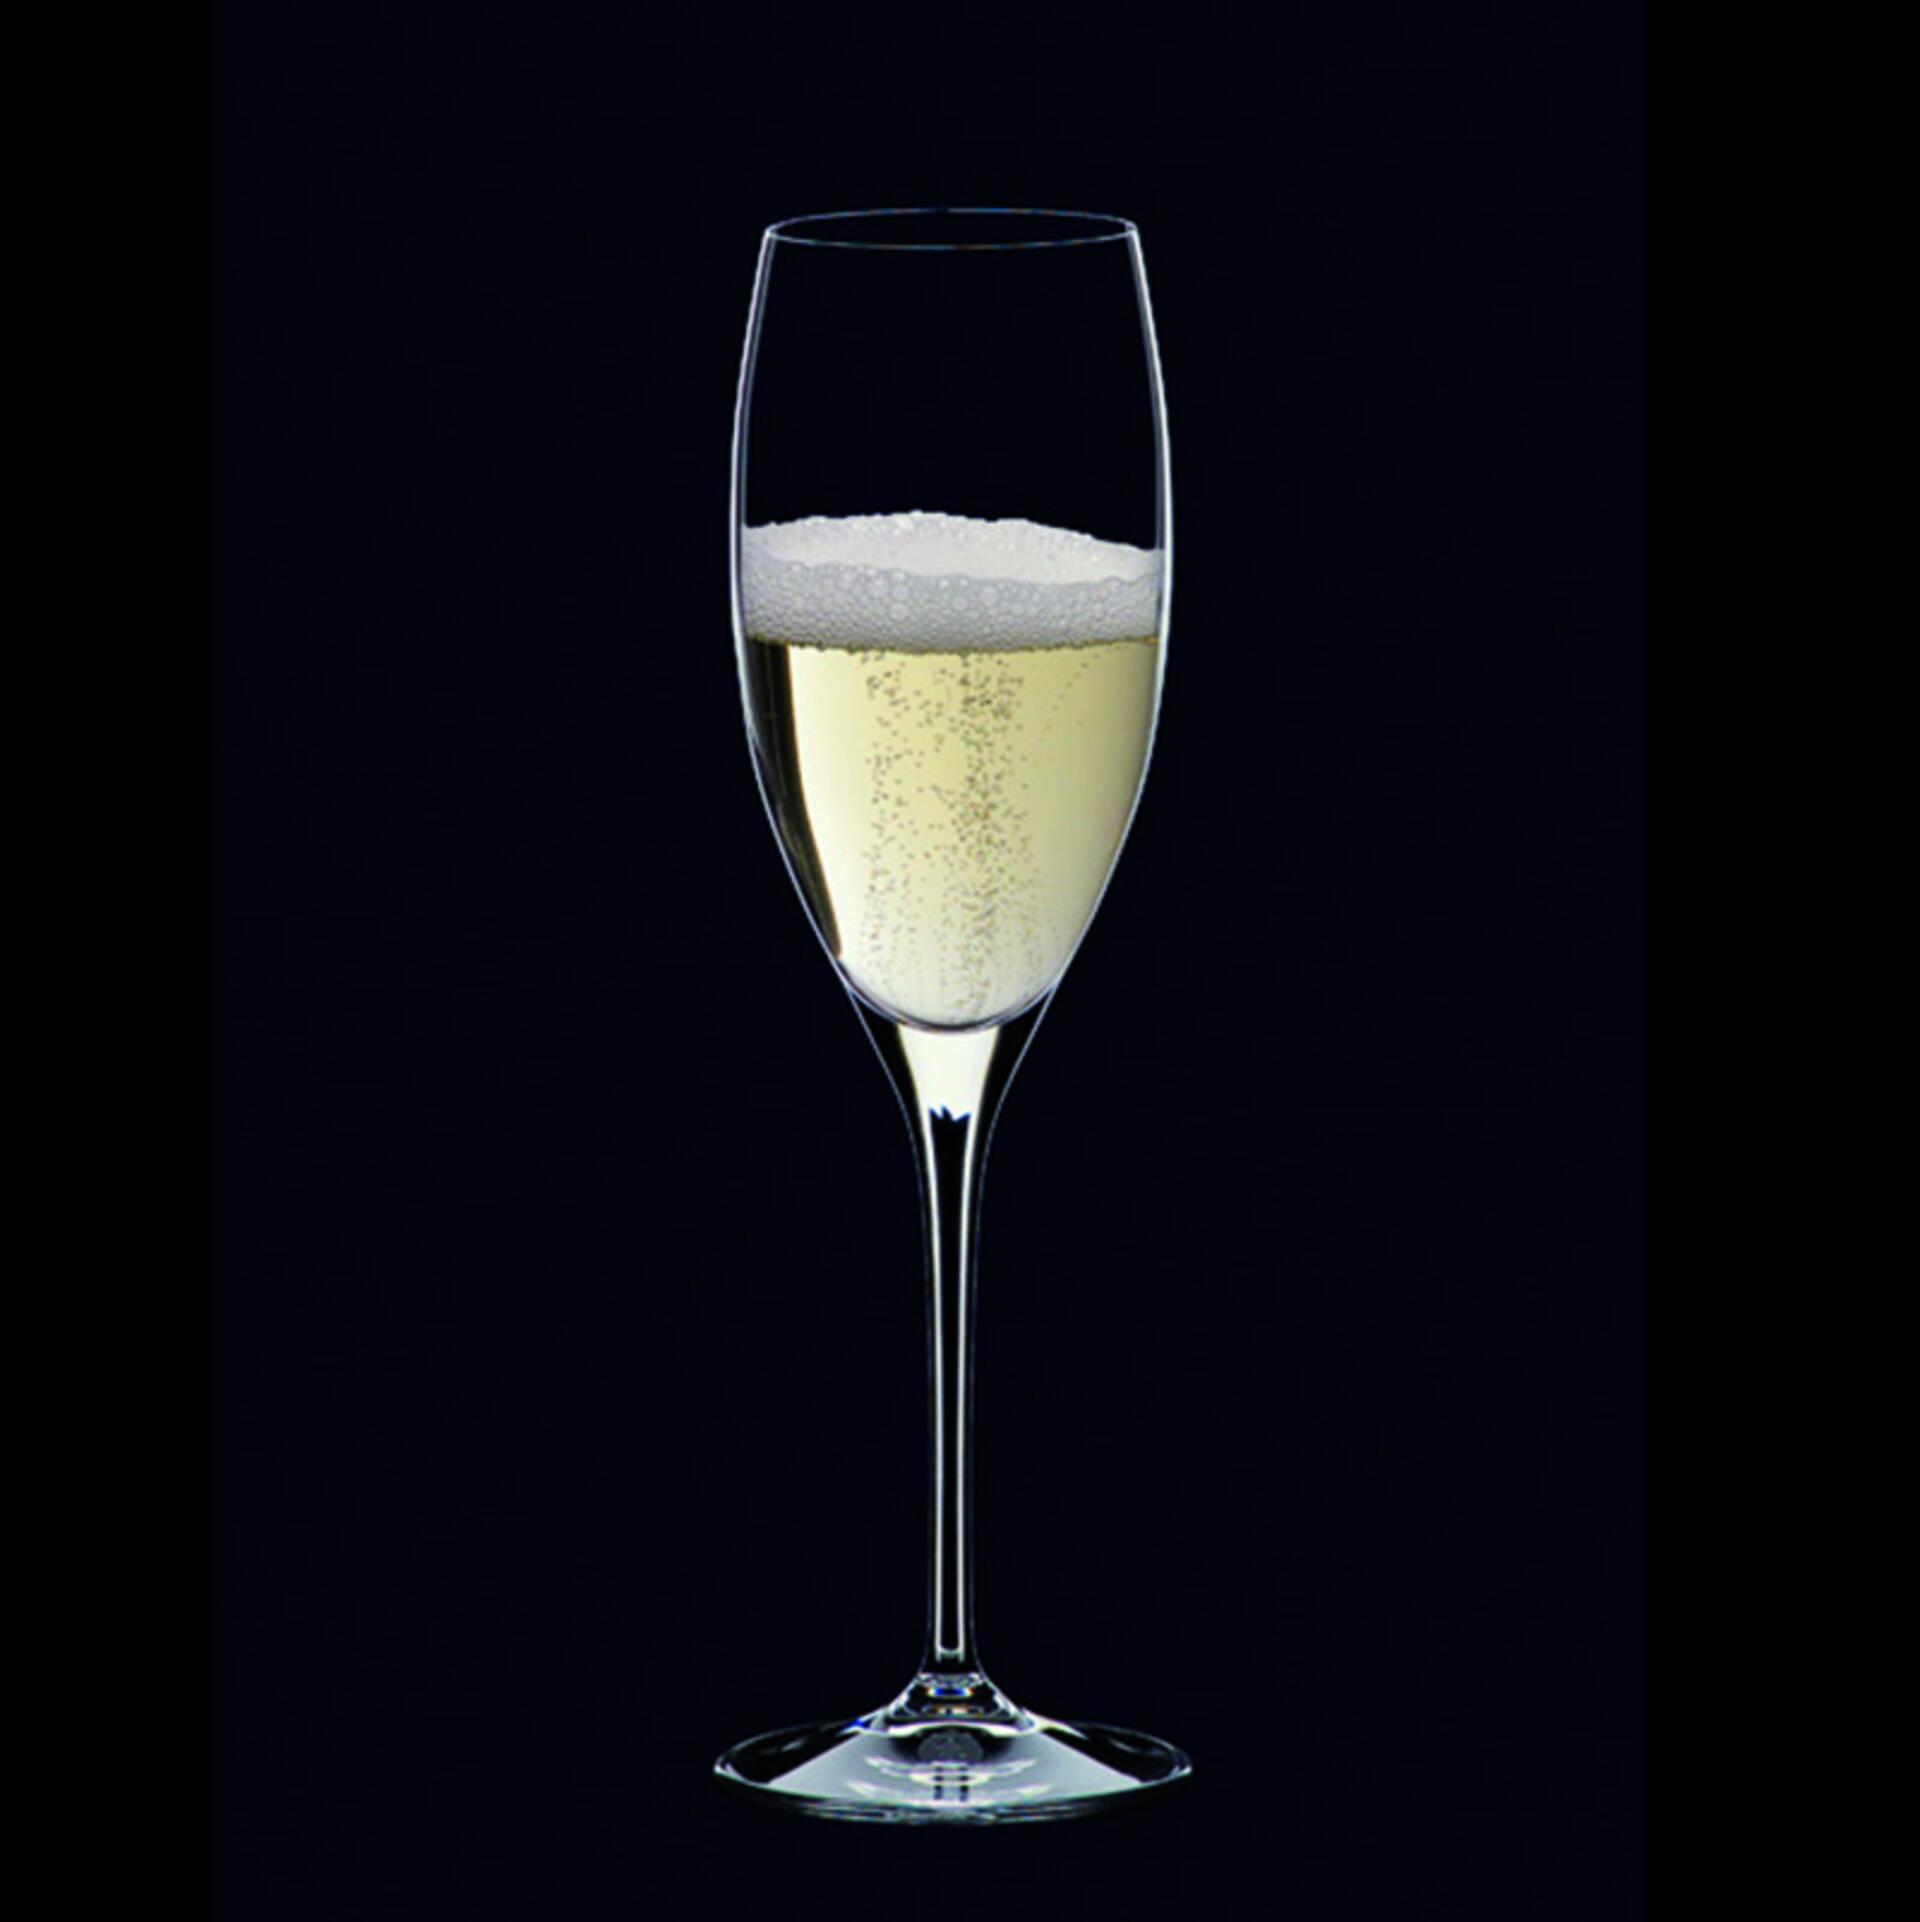 Riedel Vinum Champagnerglas Cuvée Prestige 2 Stück 6416/48